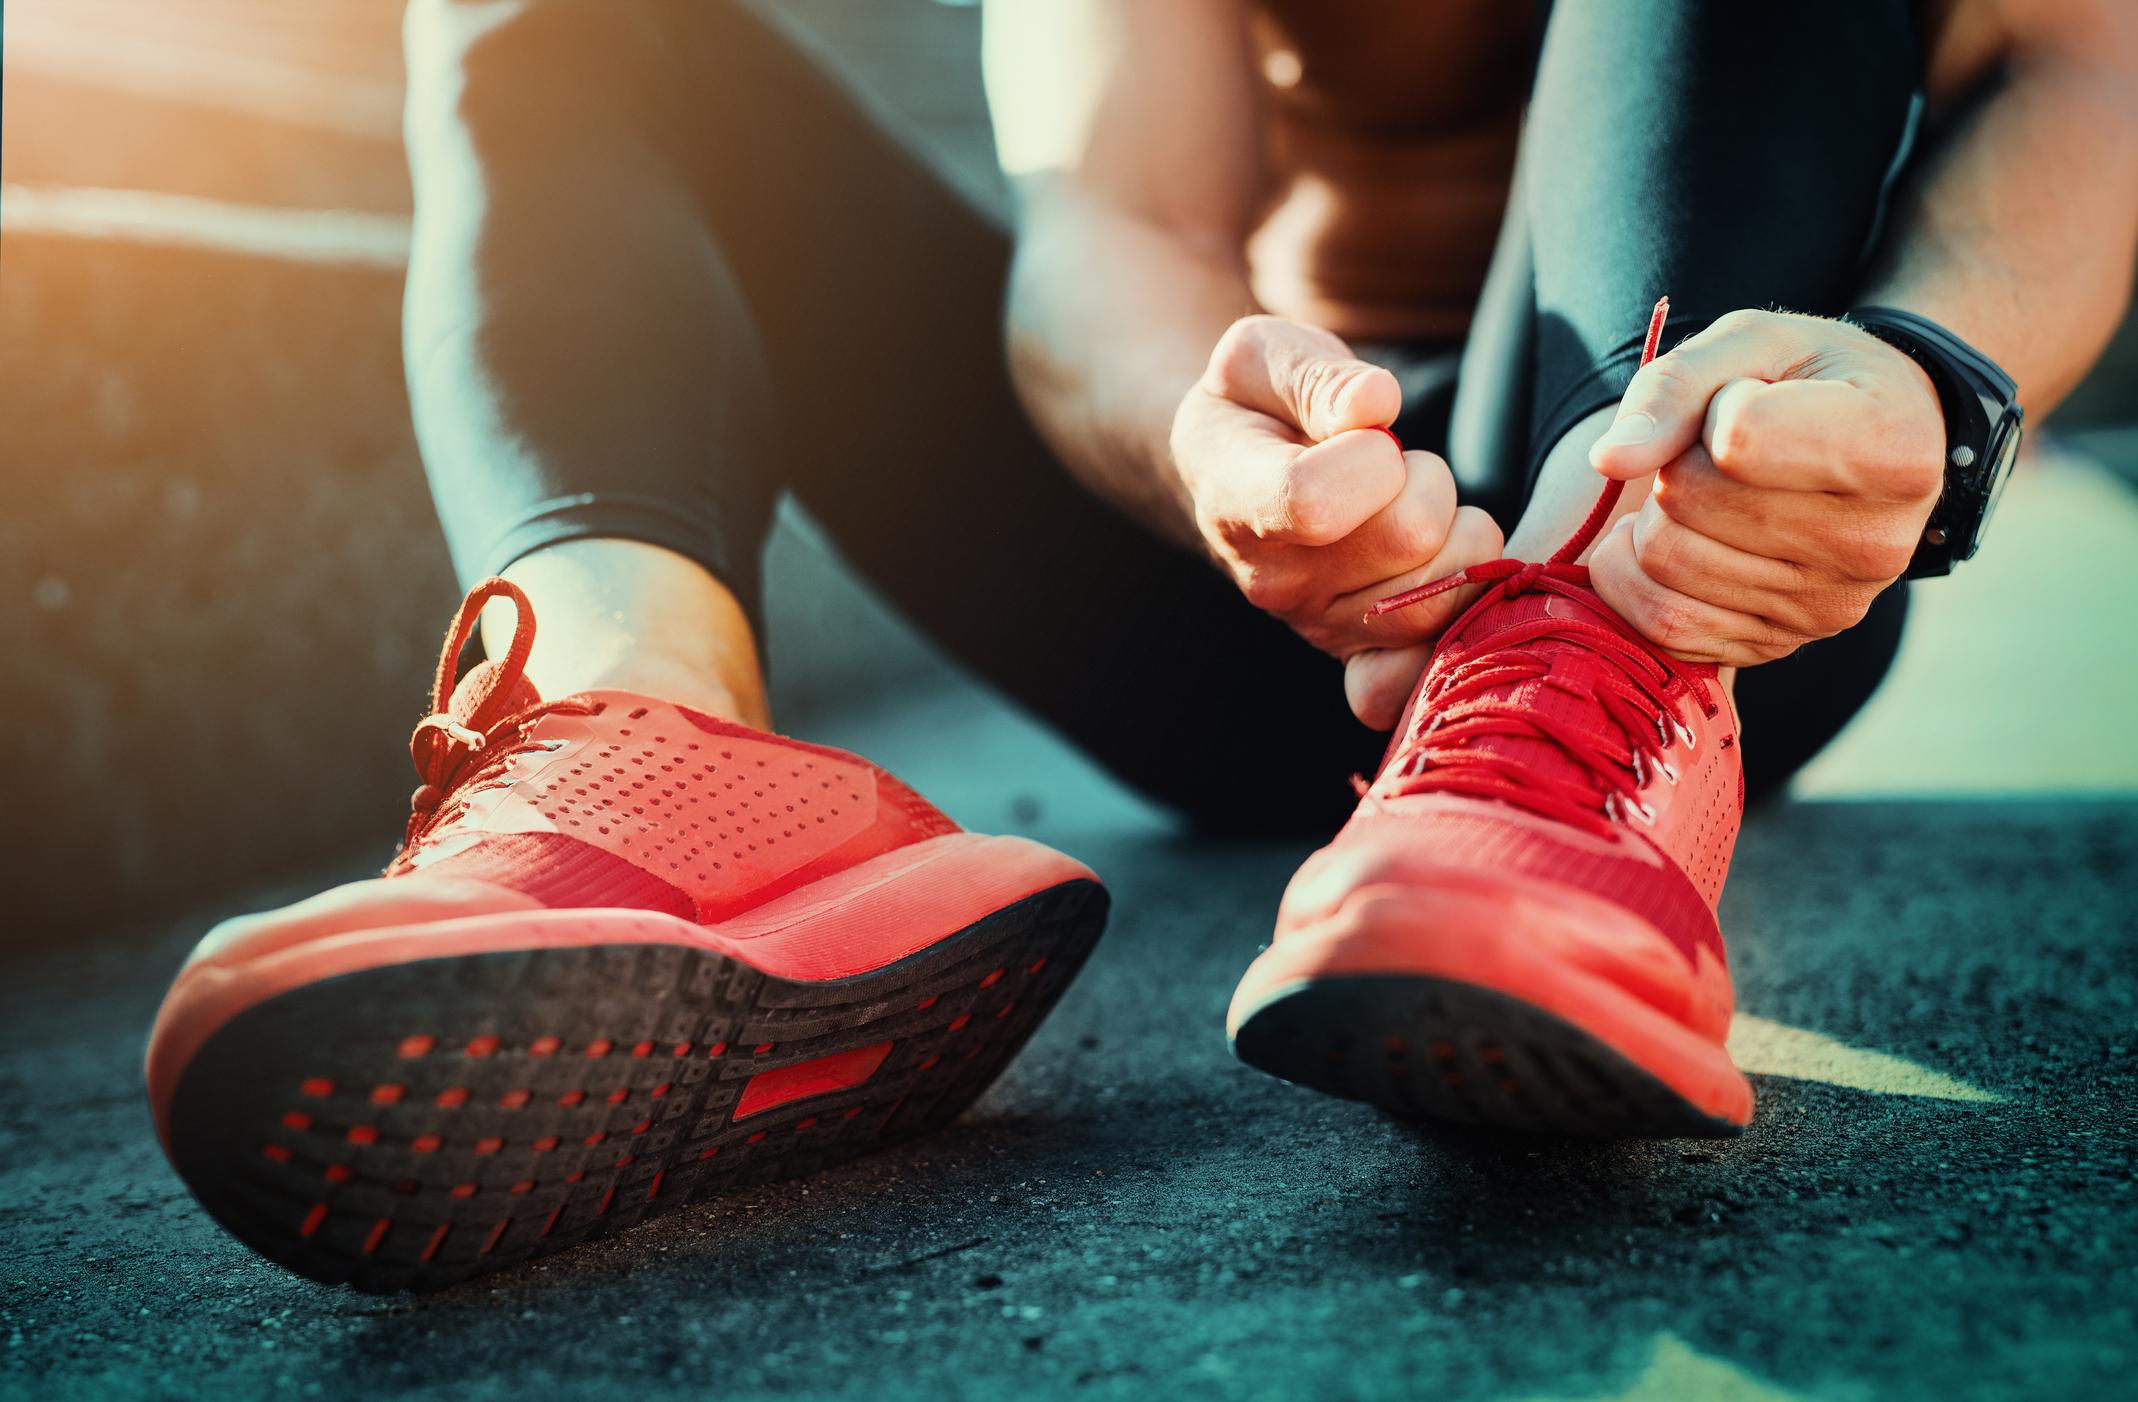 A jogger laces up.